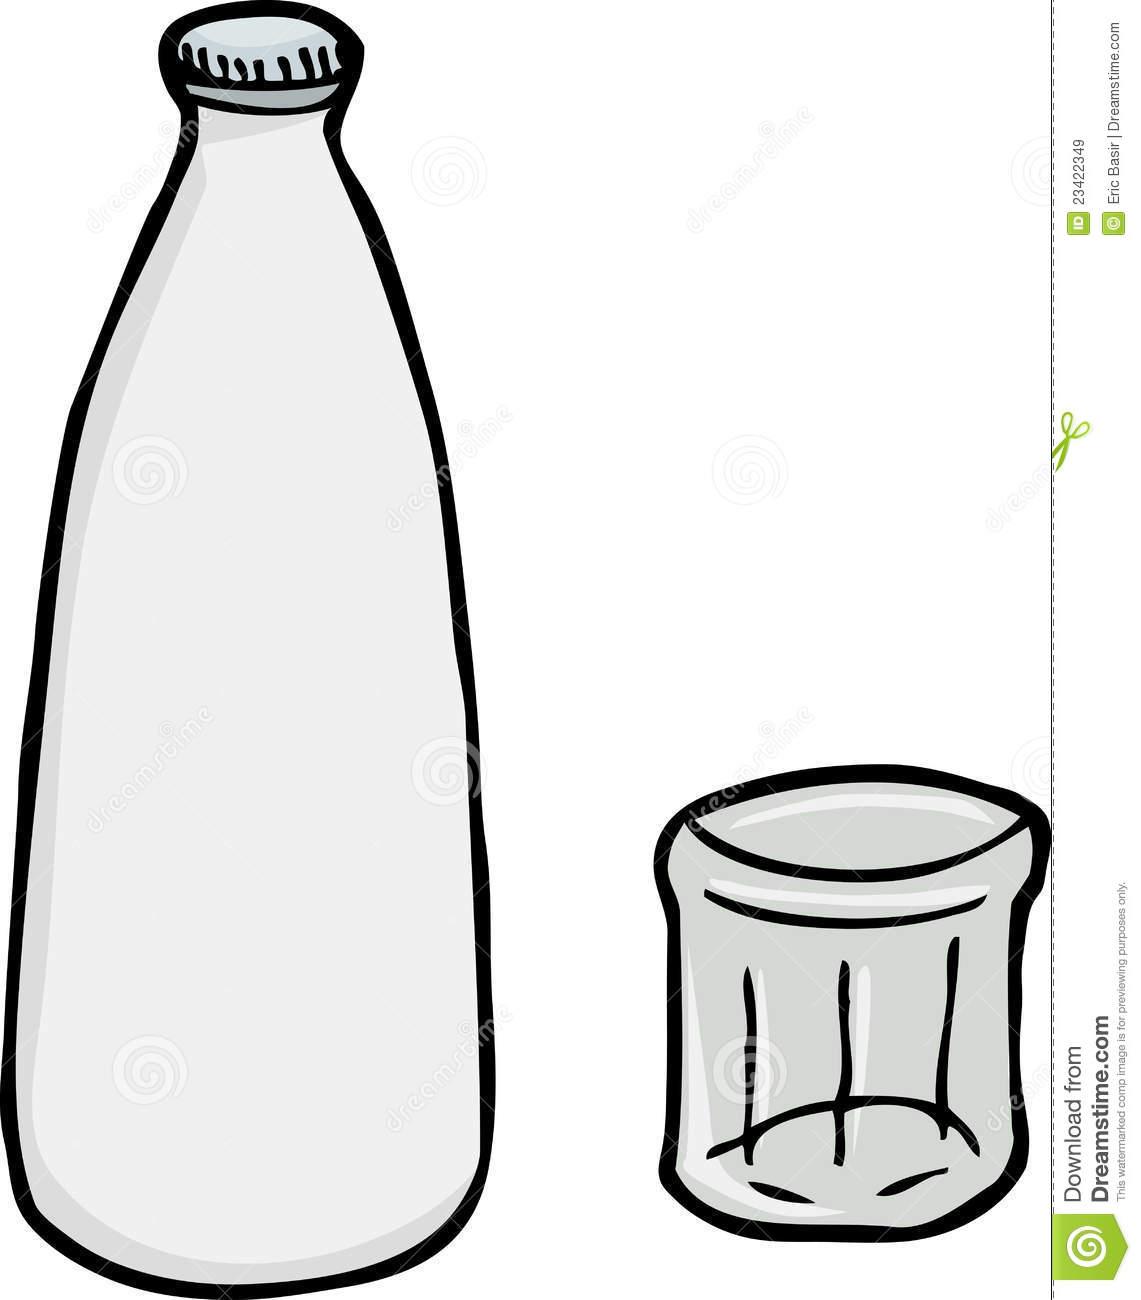 1141x1300 Milk Clipart Milk Bottle